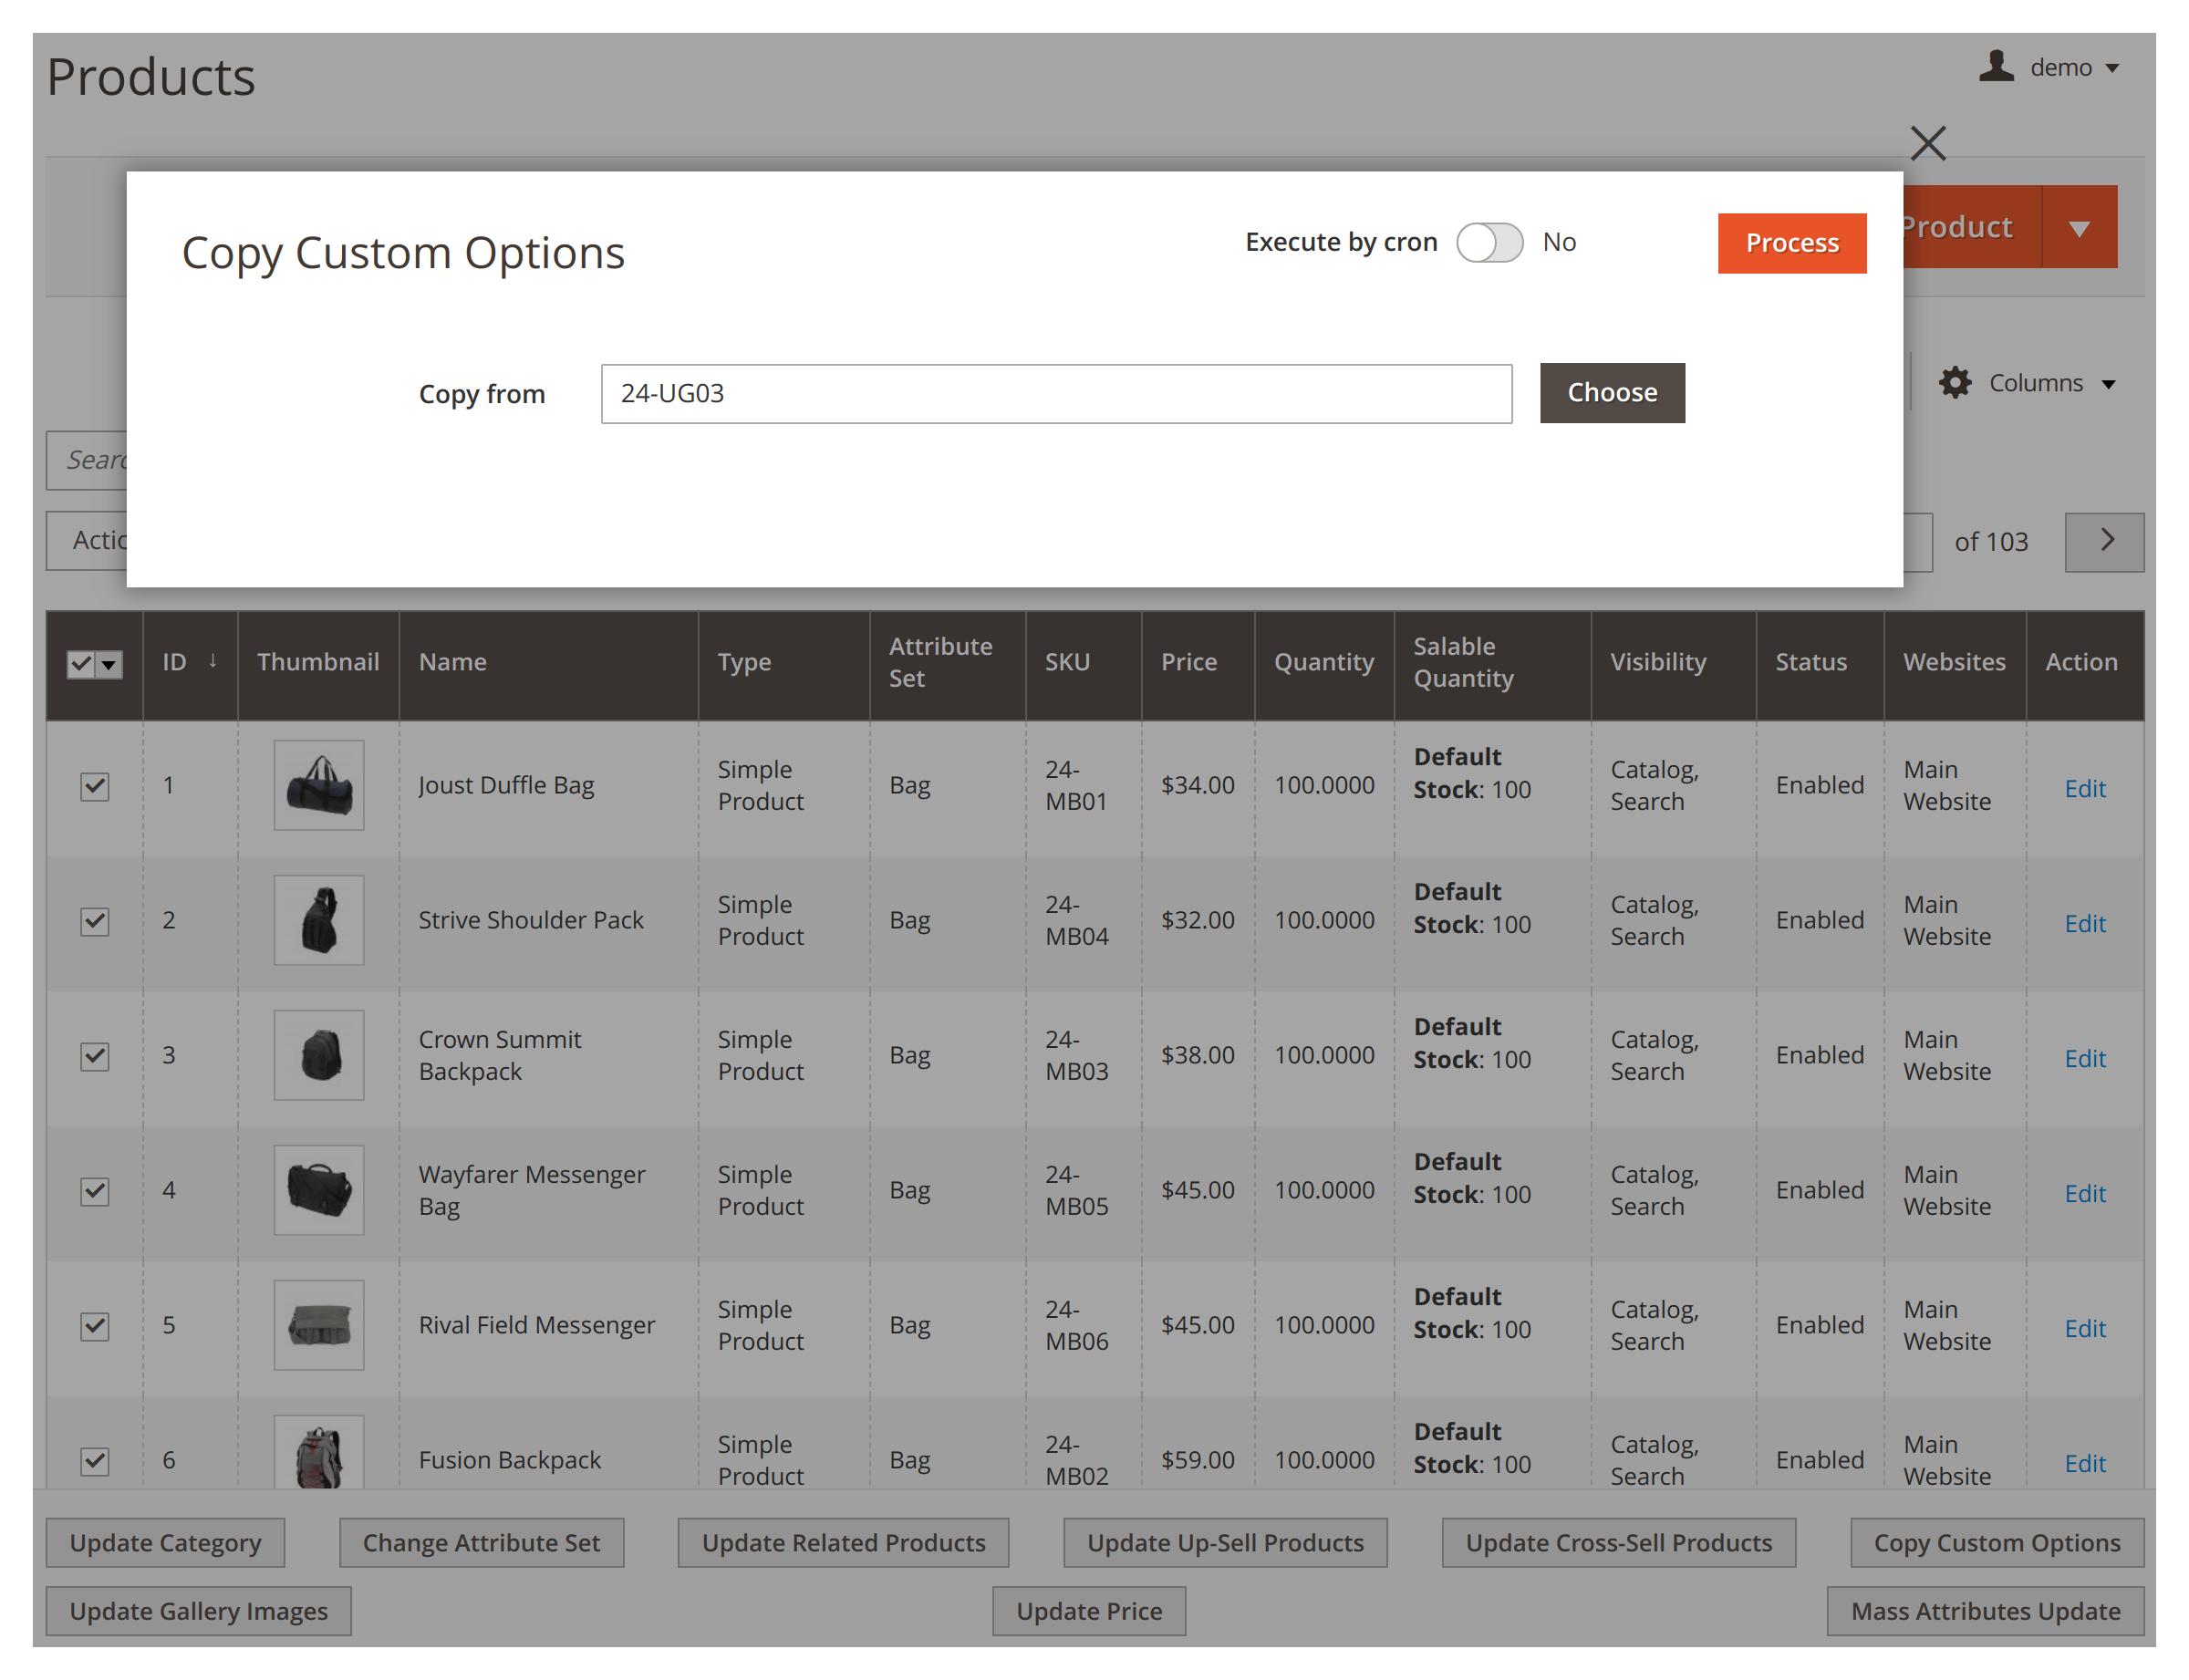 Copying custom options in bulk in Mirasvit Mass Product Actions Magento 2 module.